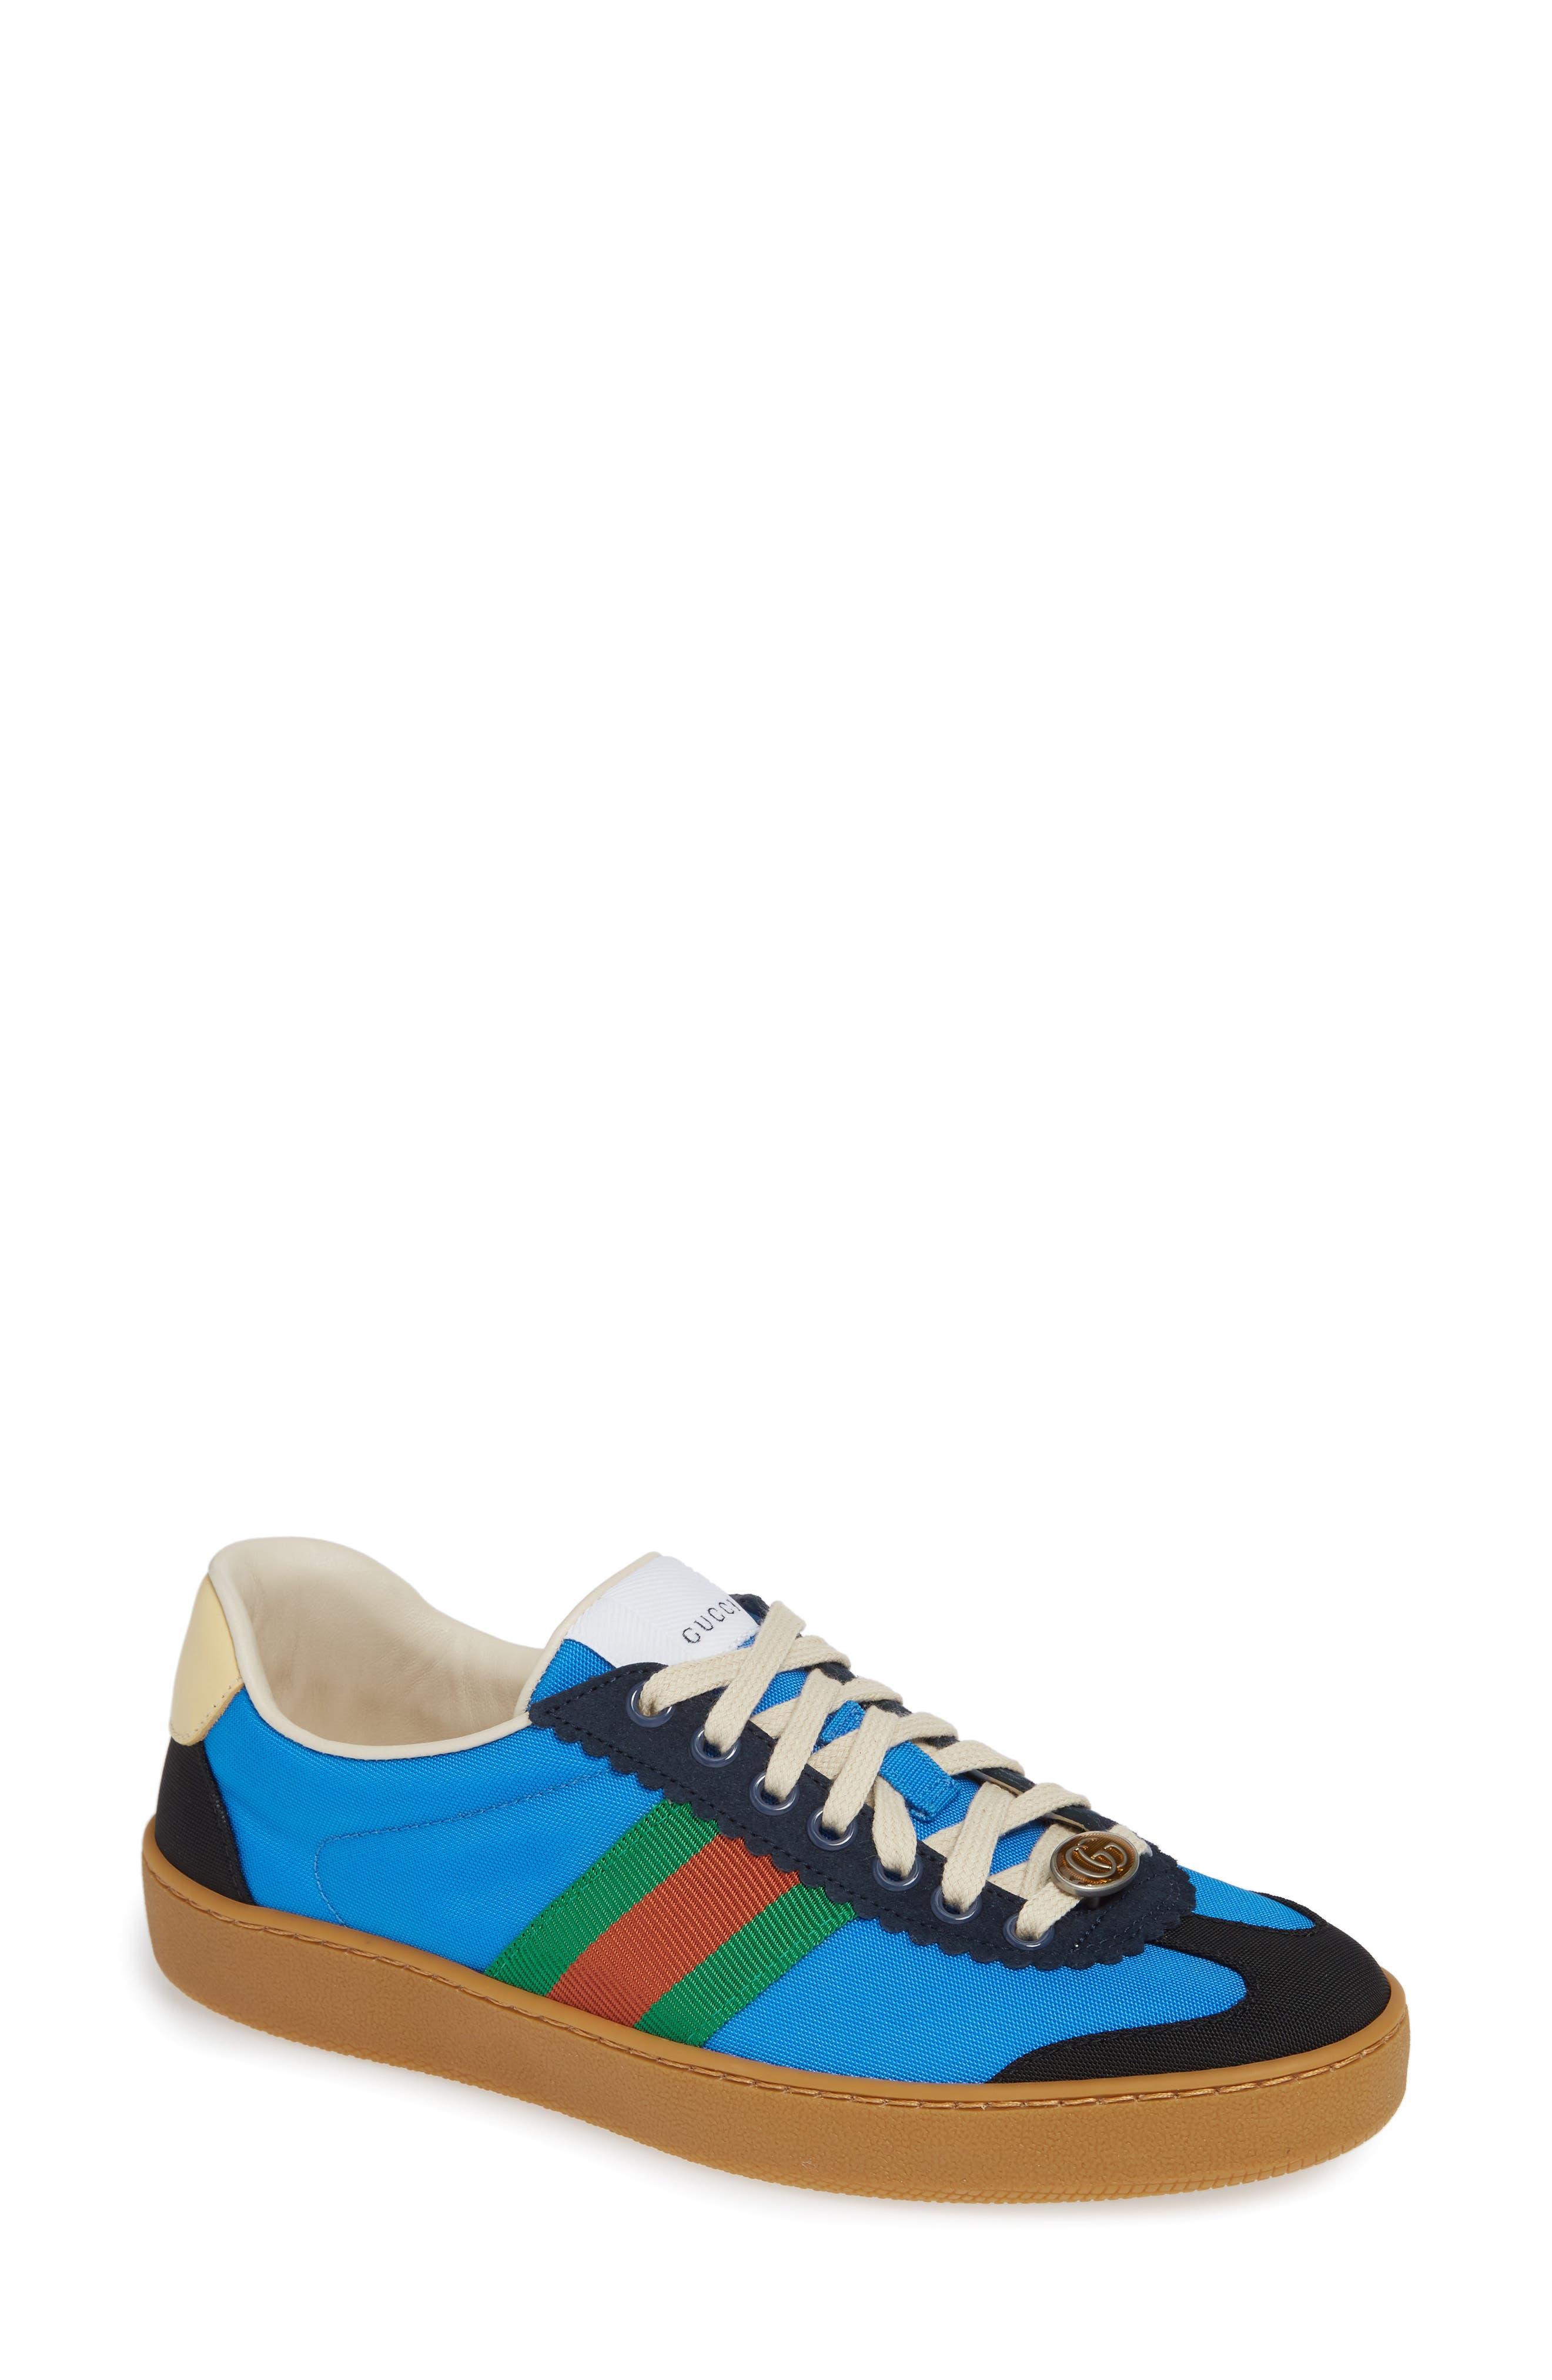 GUCCI G74 Low Top Sneaker, Main, color, 400